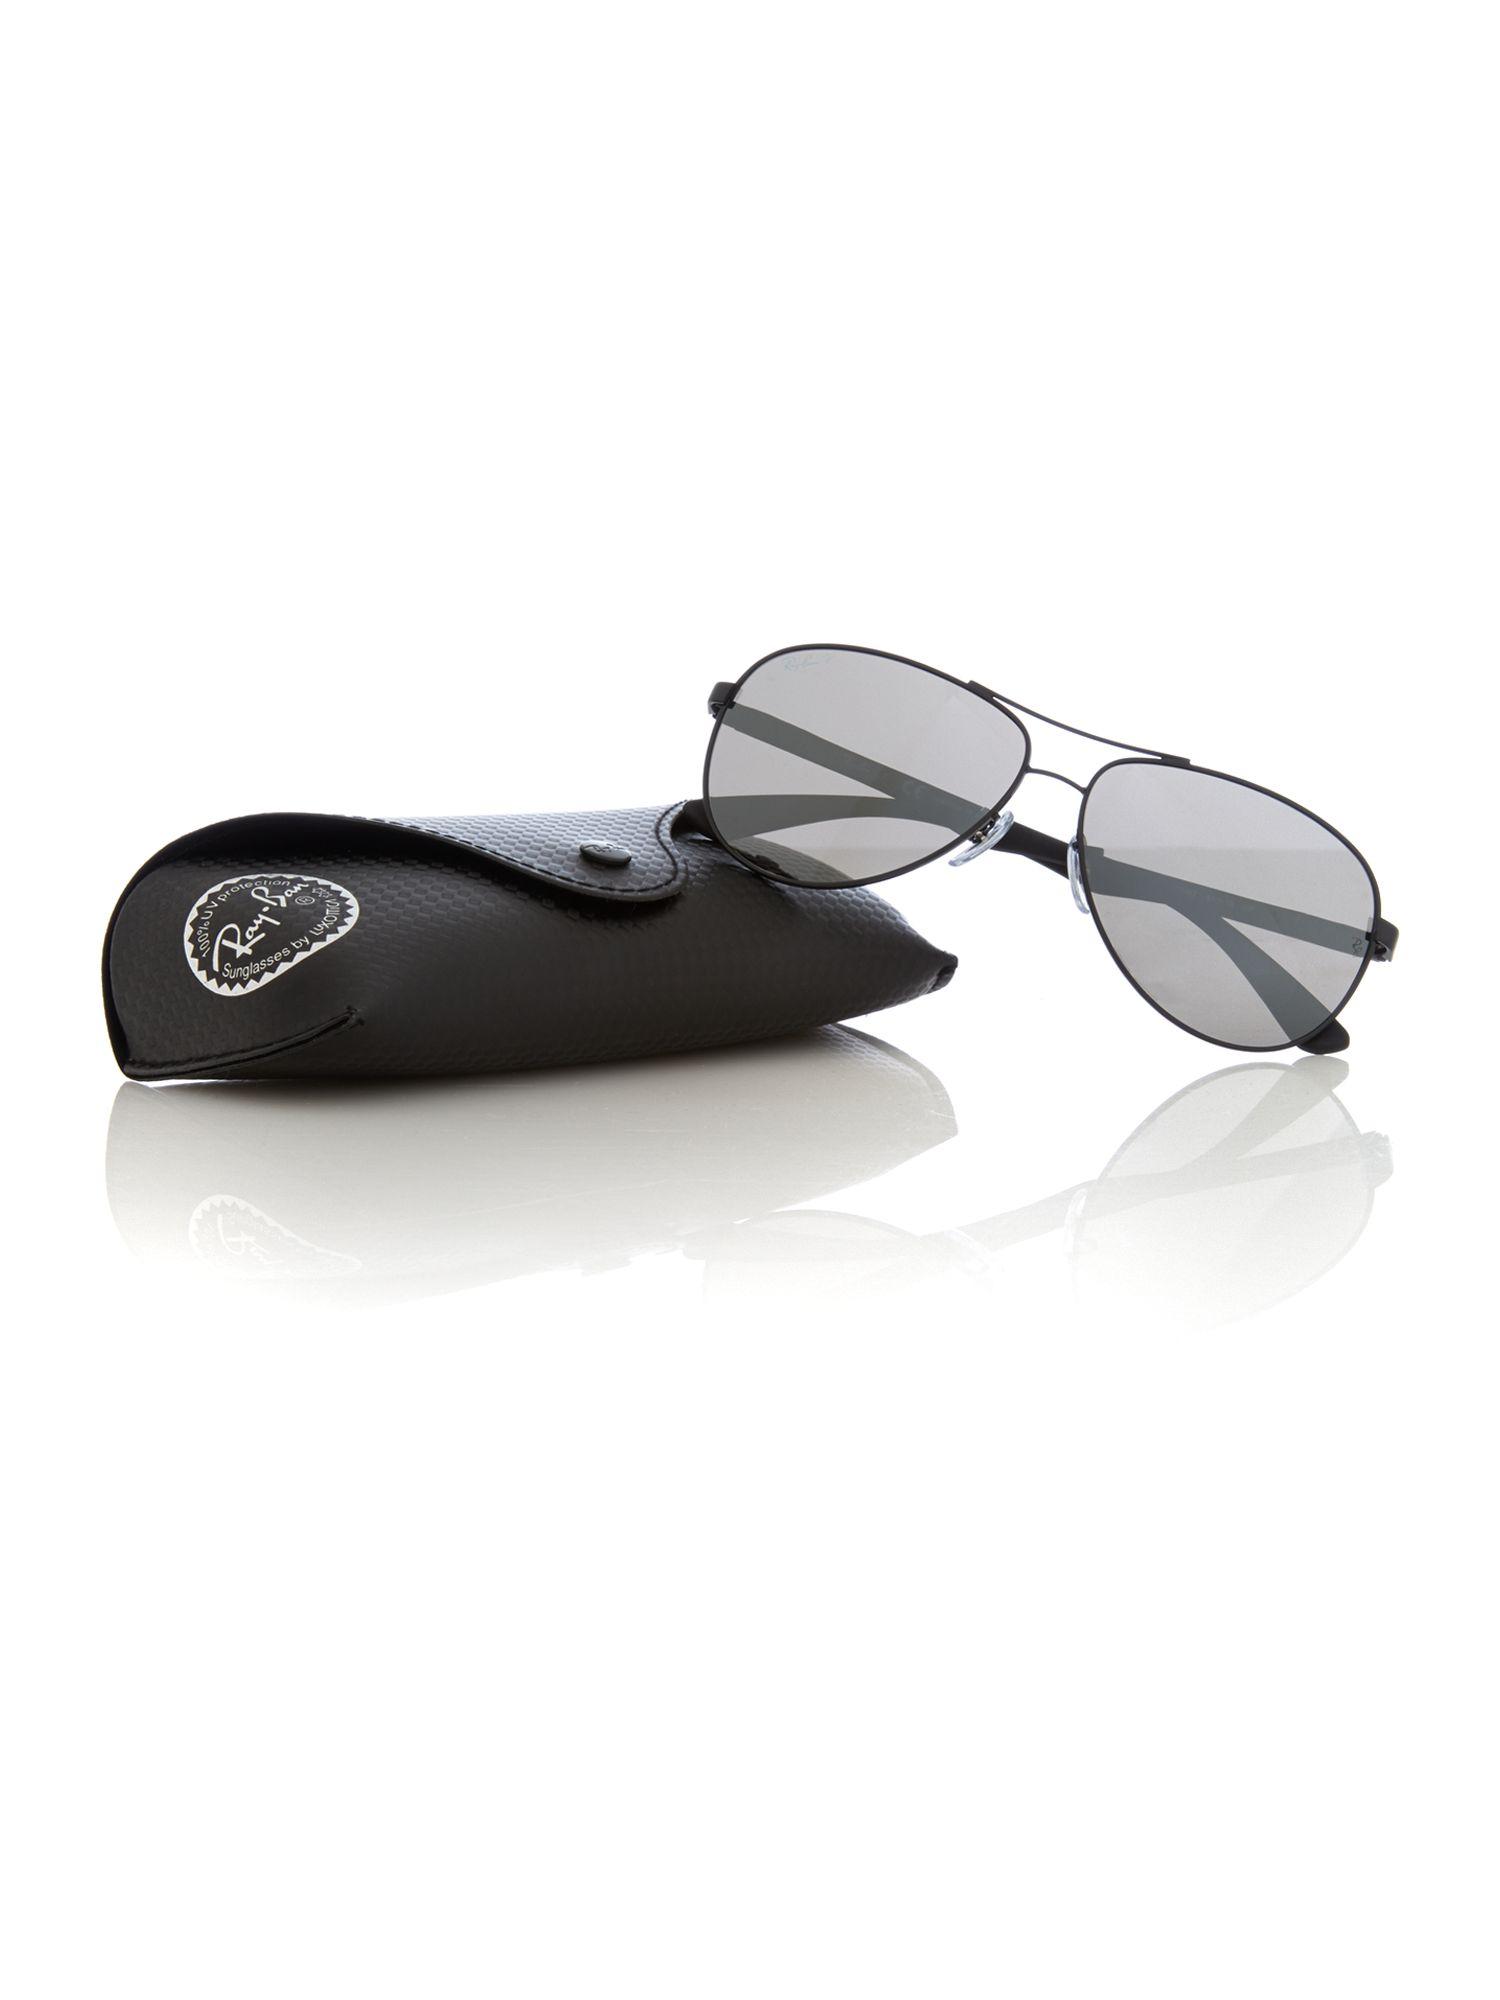 2757cd64e2 Ray-ban Men s 0rb8313 Aviator Sunglasses